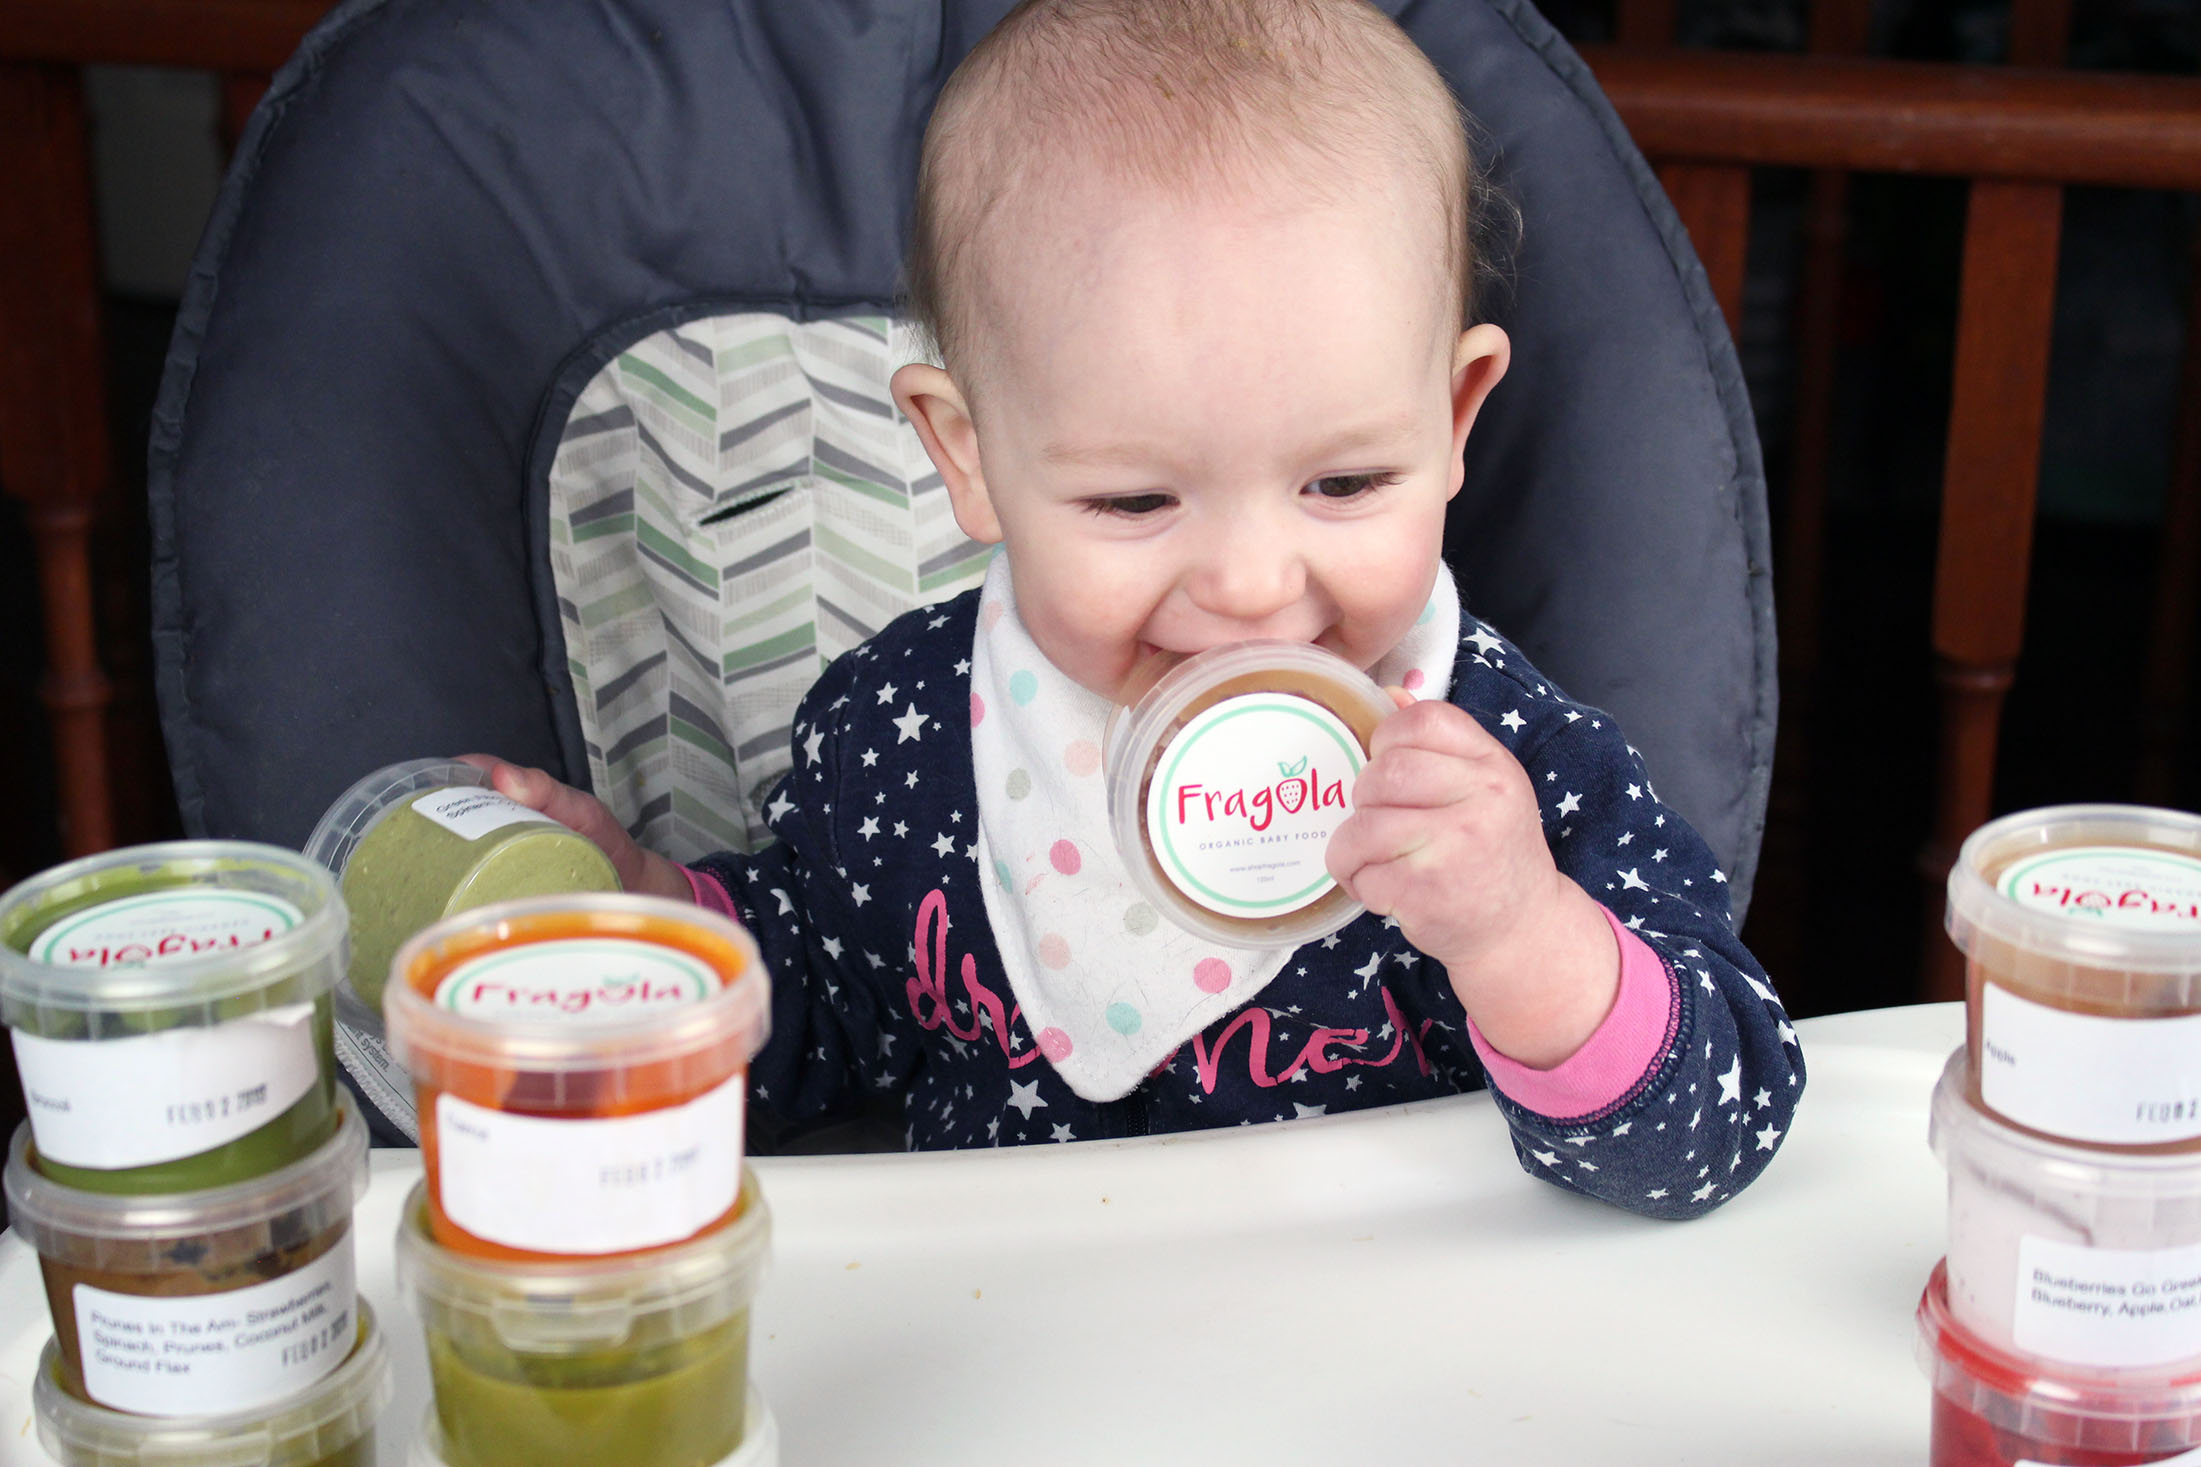 Real Food for Babies: Fragola Organic Baby Food